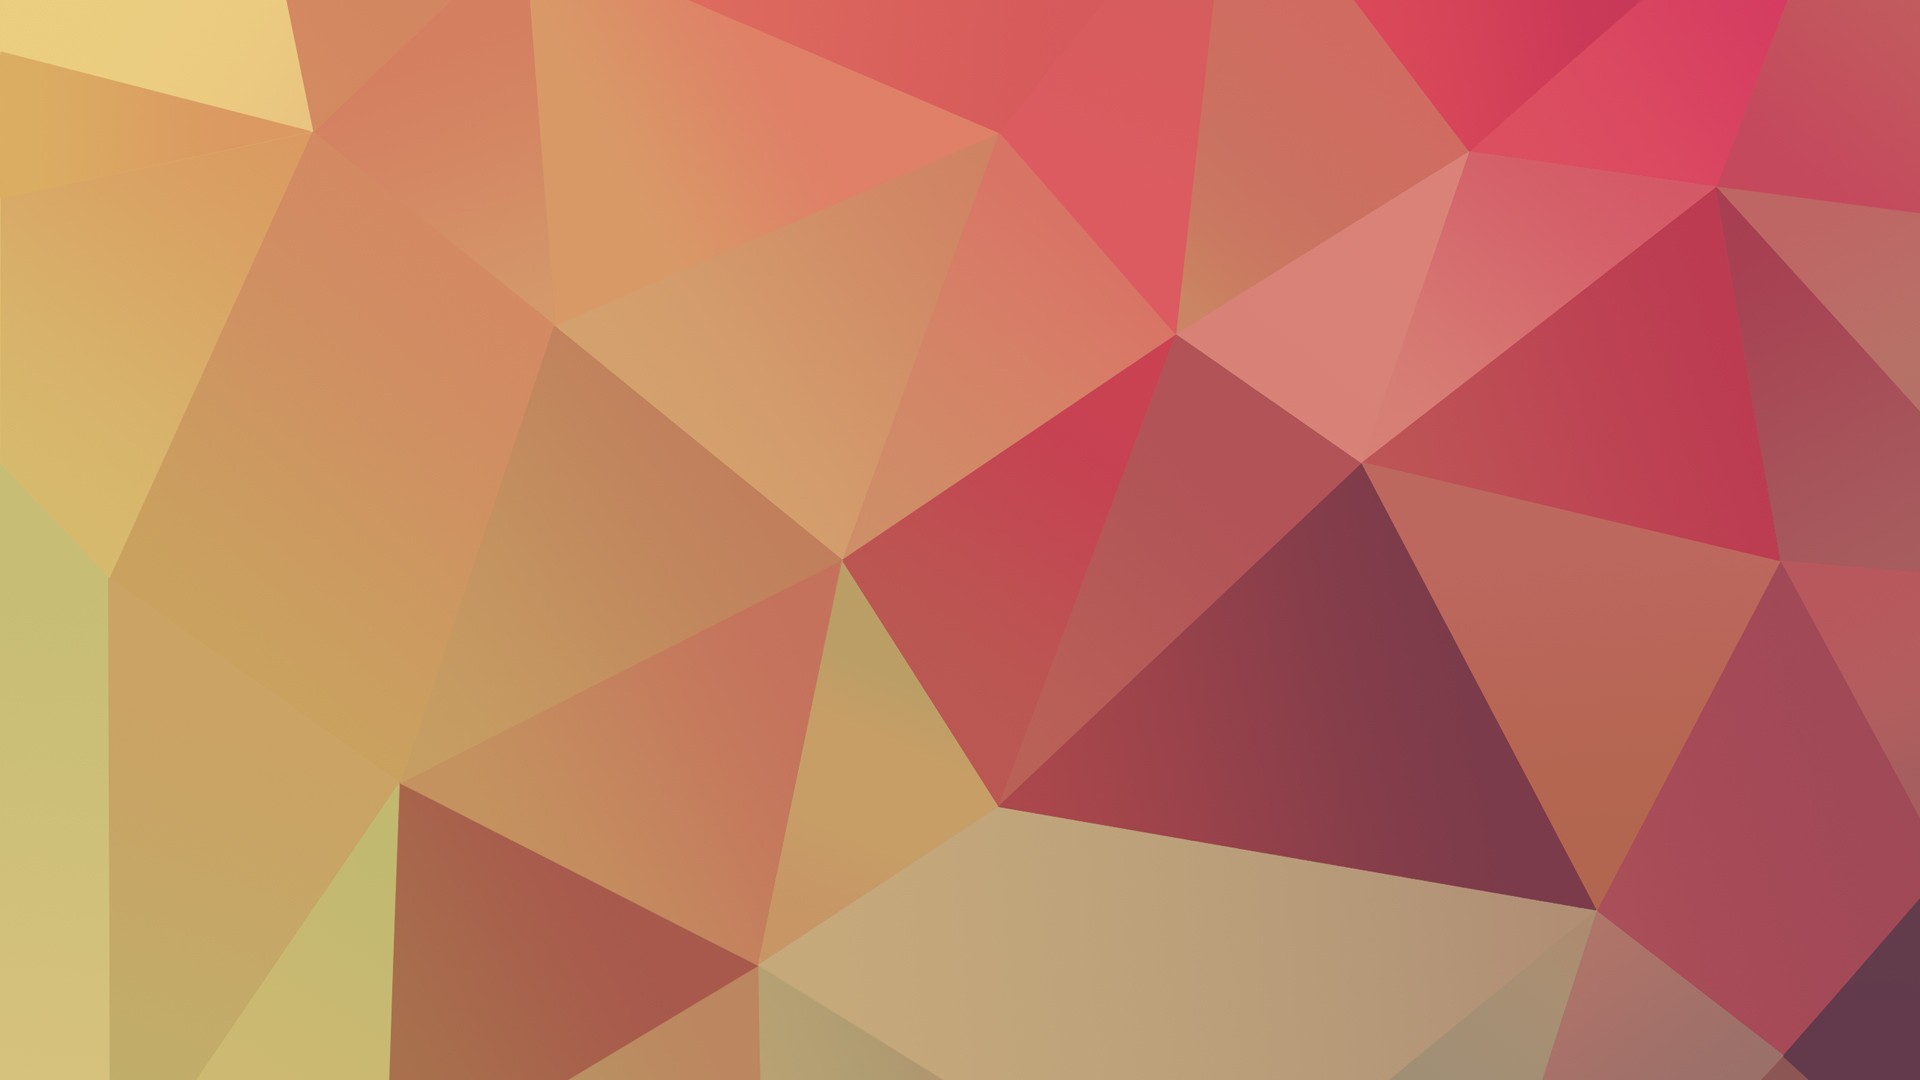 Free Colorful Geometric Wallpaper: Geometric Desktop Wallpaper